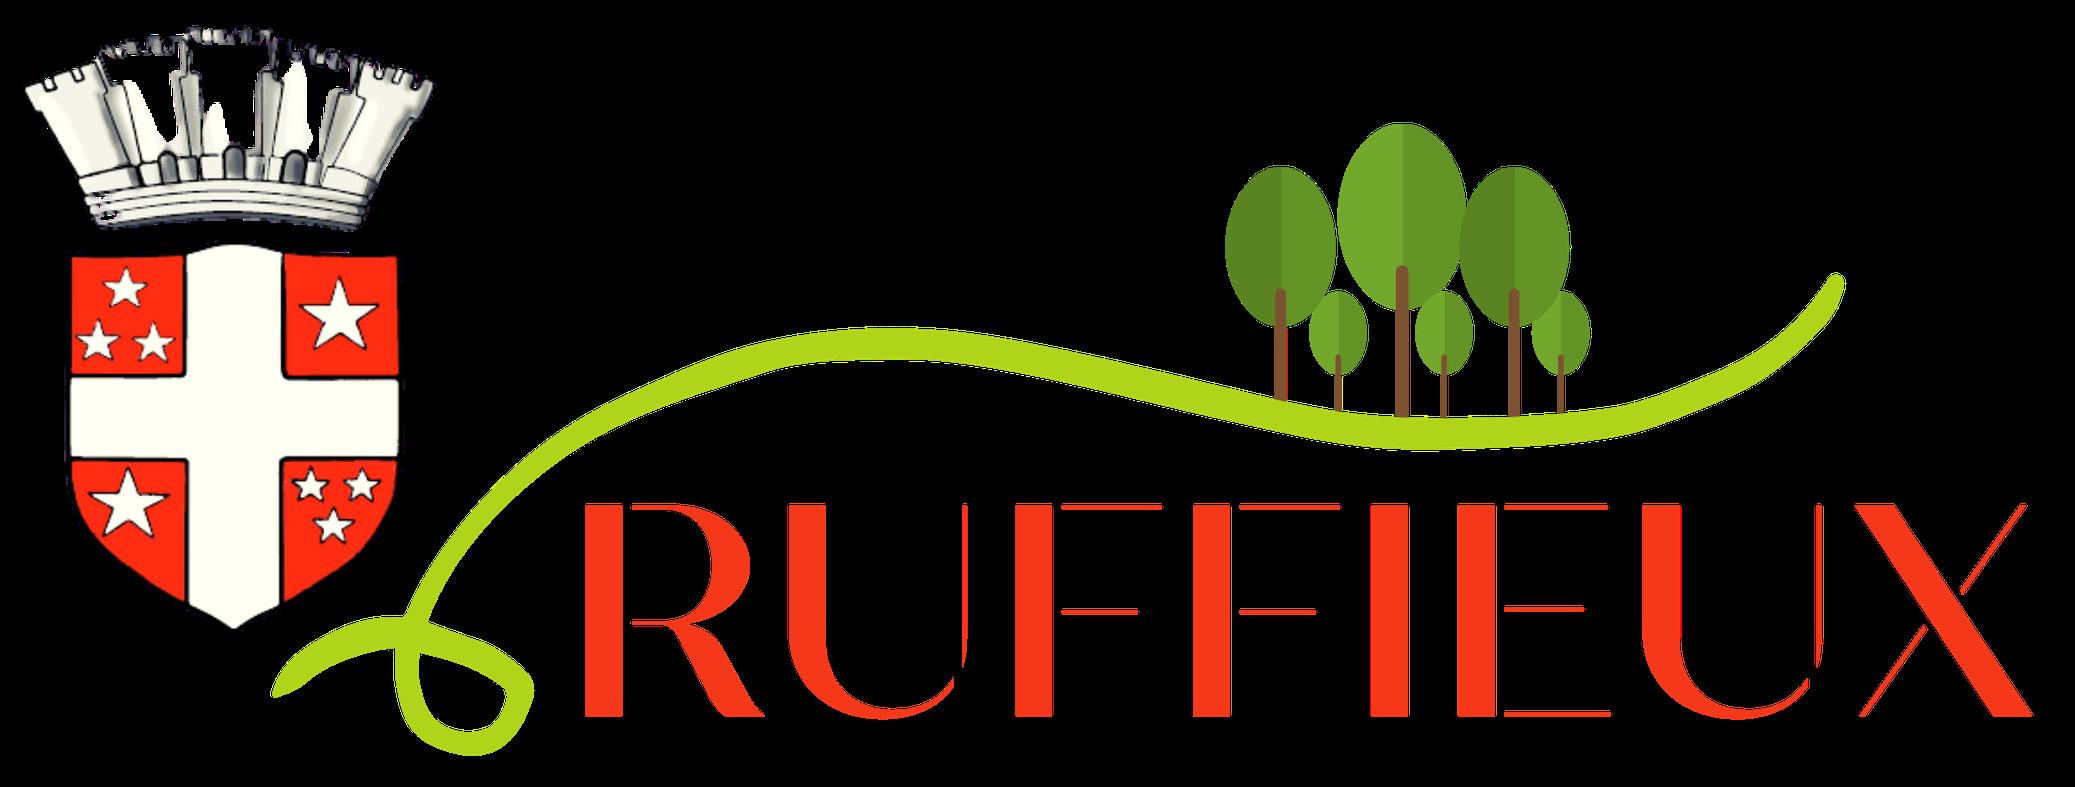 Ruffieux 73